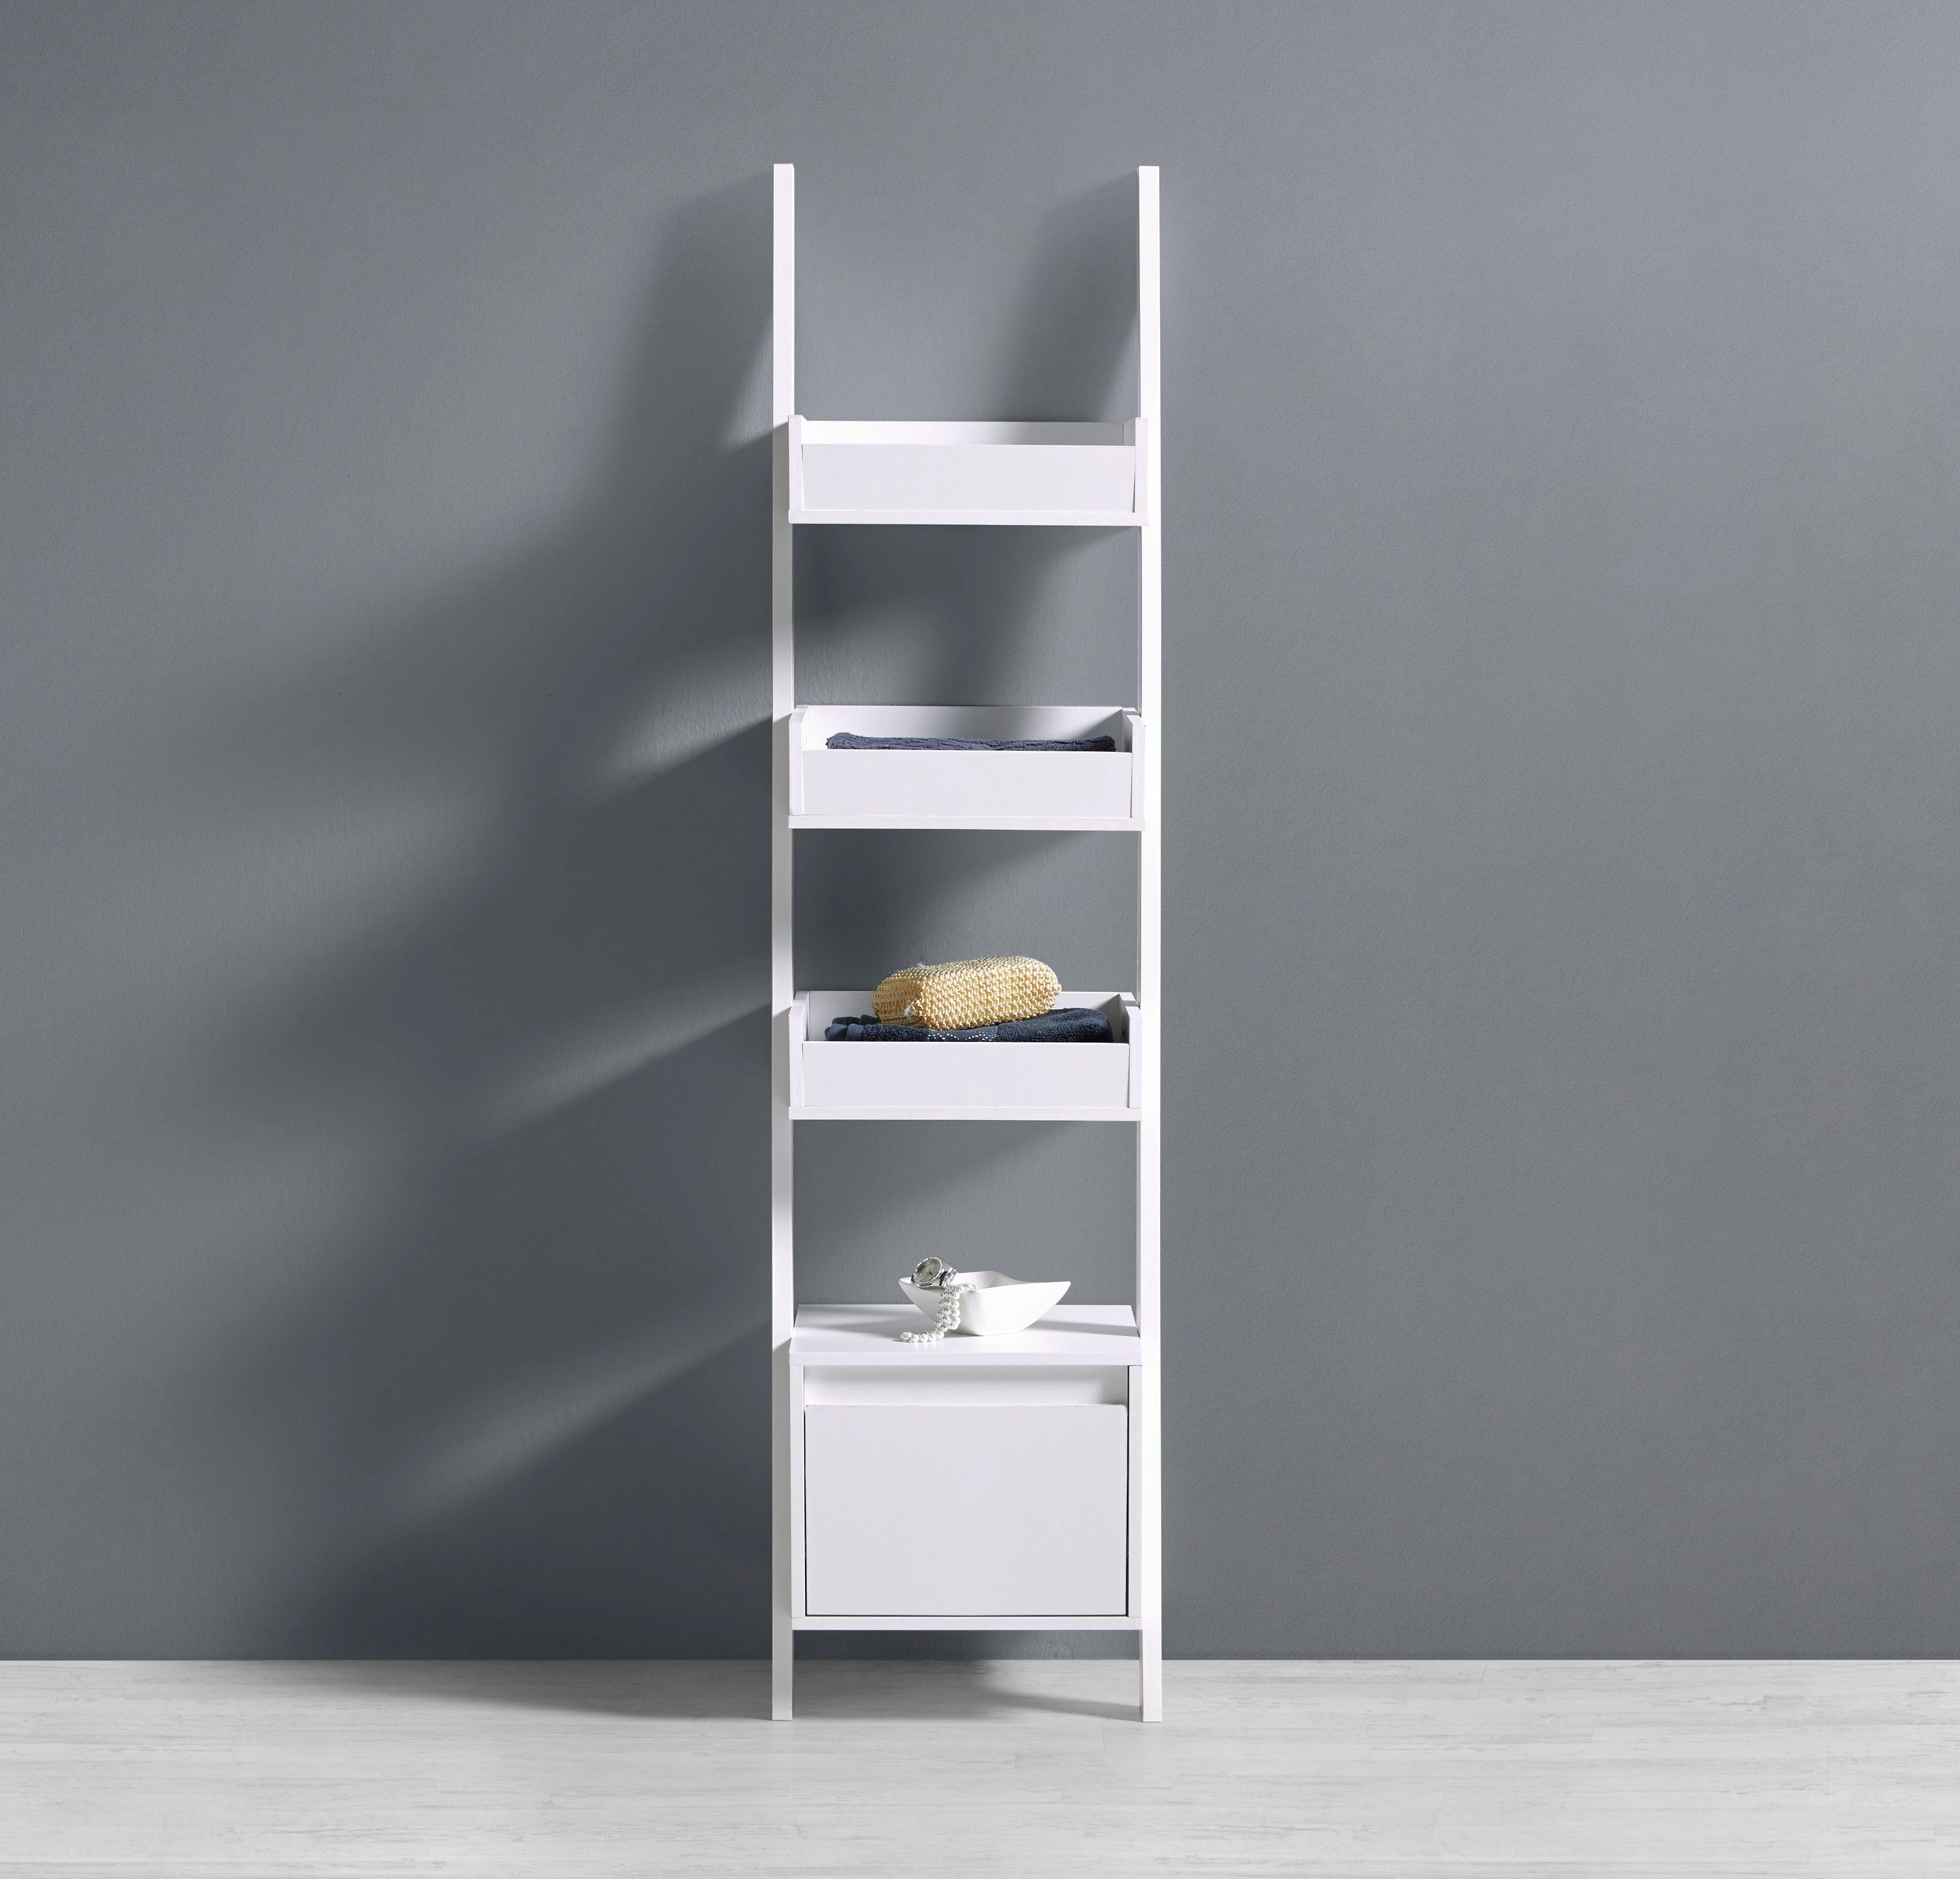 Regal Basic - Weiß, MODERN, Holz/Holzwerkstoff (36/146,5/36,5cm) - MODERN LIVING